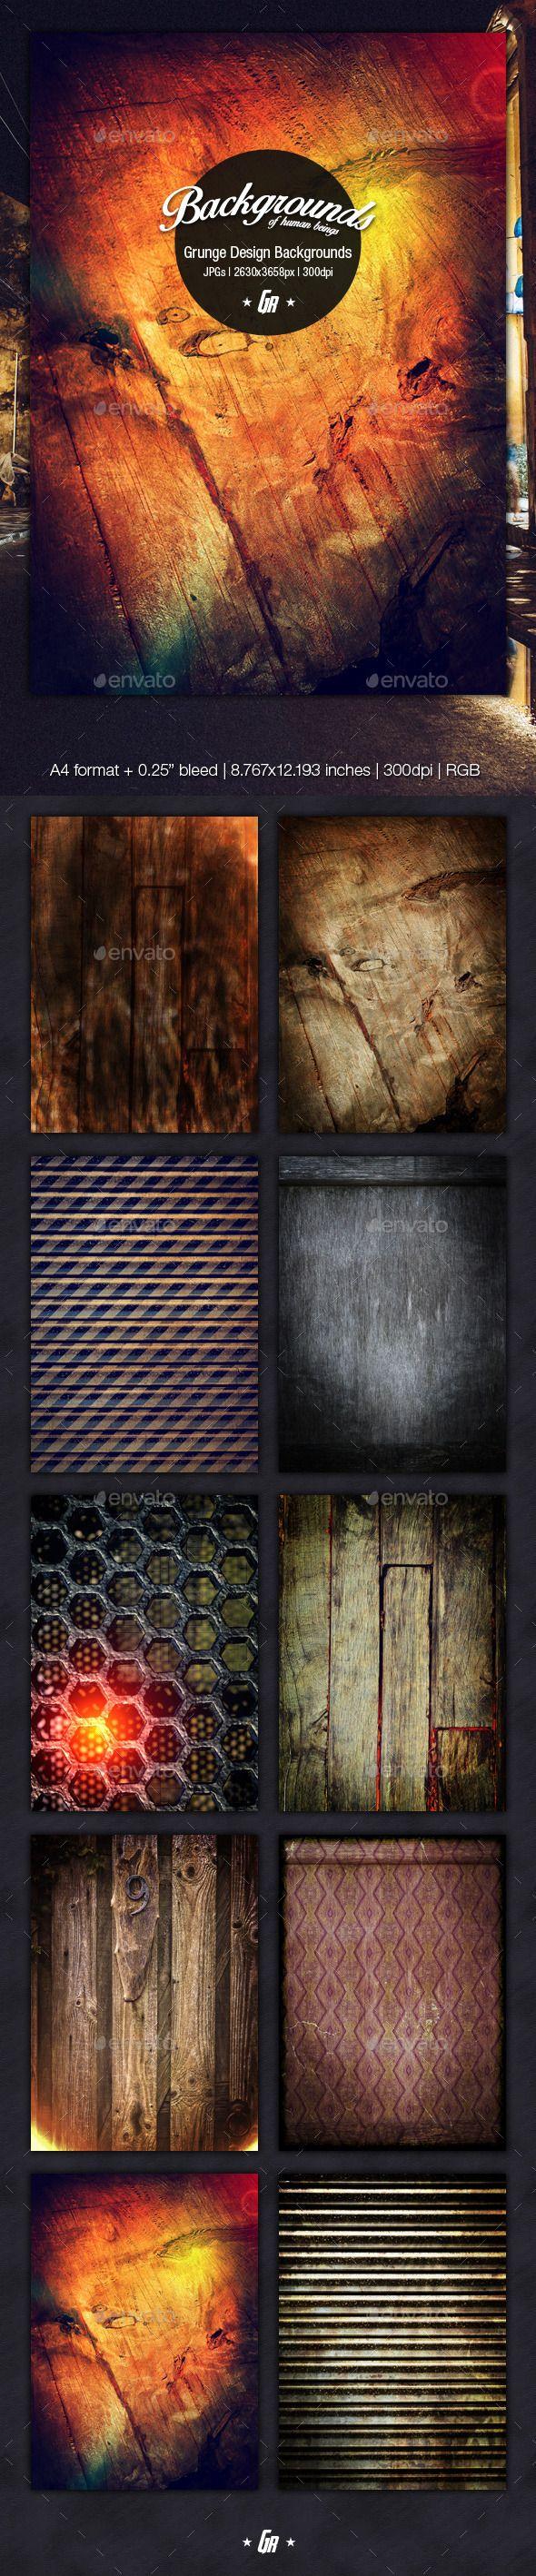 Grunge Design Backgrounds - A4 (high resolution backgrounds, 300dpi)